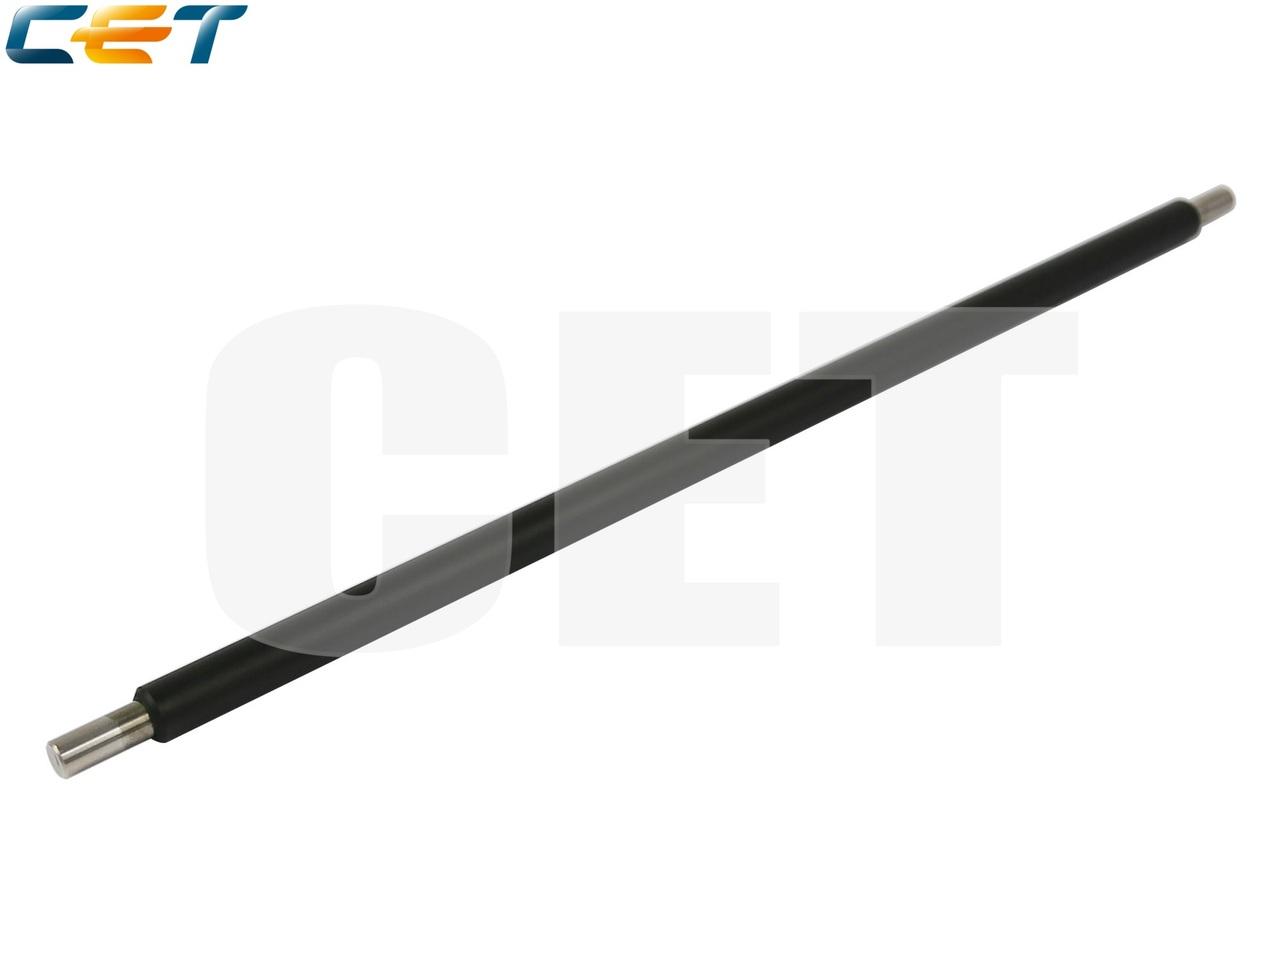 Ролик заряда для XEROX Versant 80/2100 Press (CET),CET7962